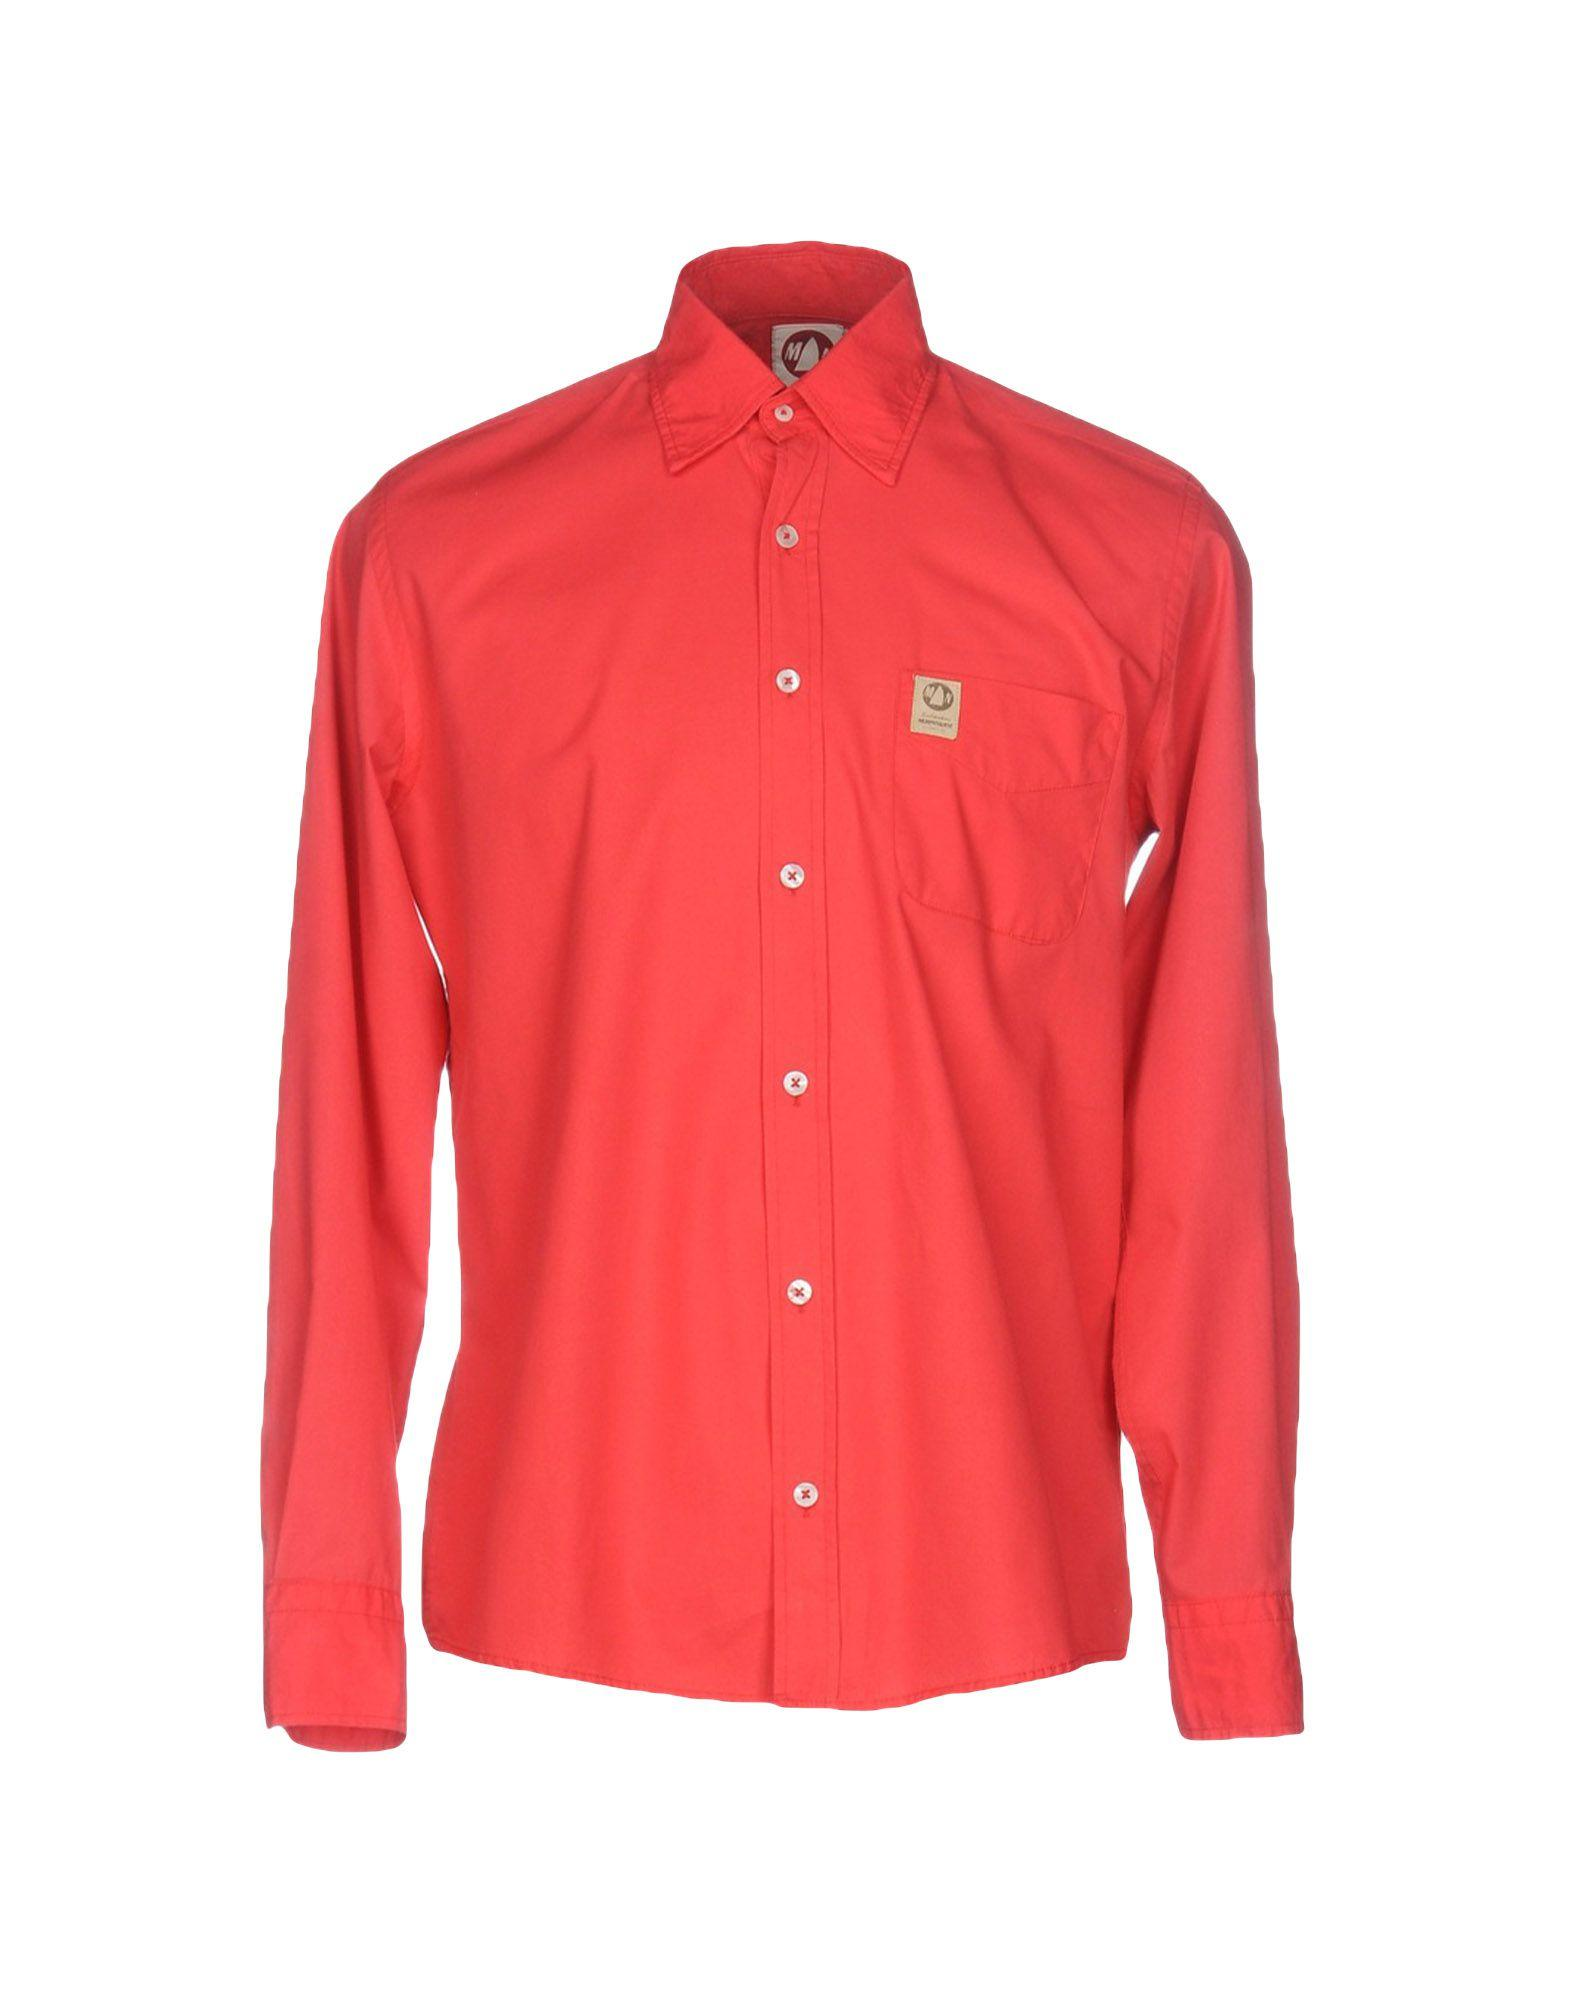 murphy nye shirt in red for men lyst. Black Bedroom Furniture Sets. Home Design Ideas